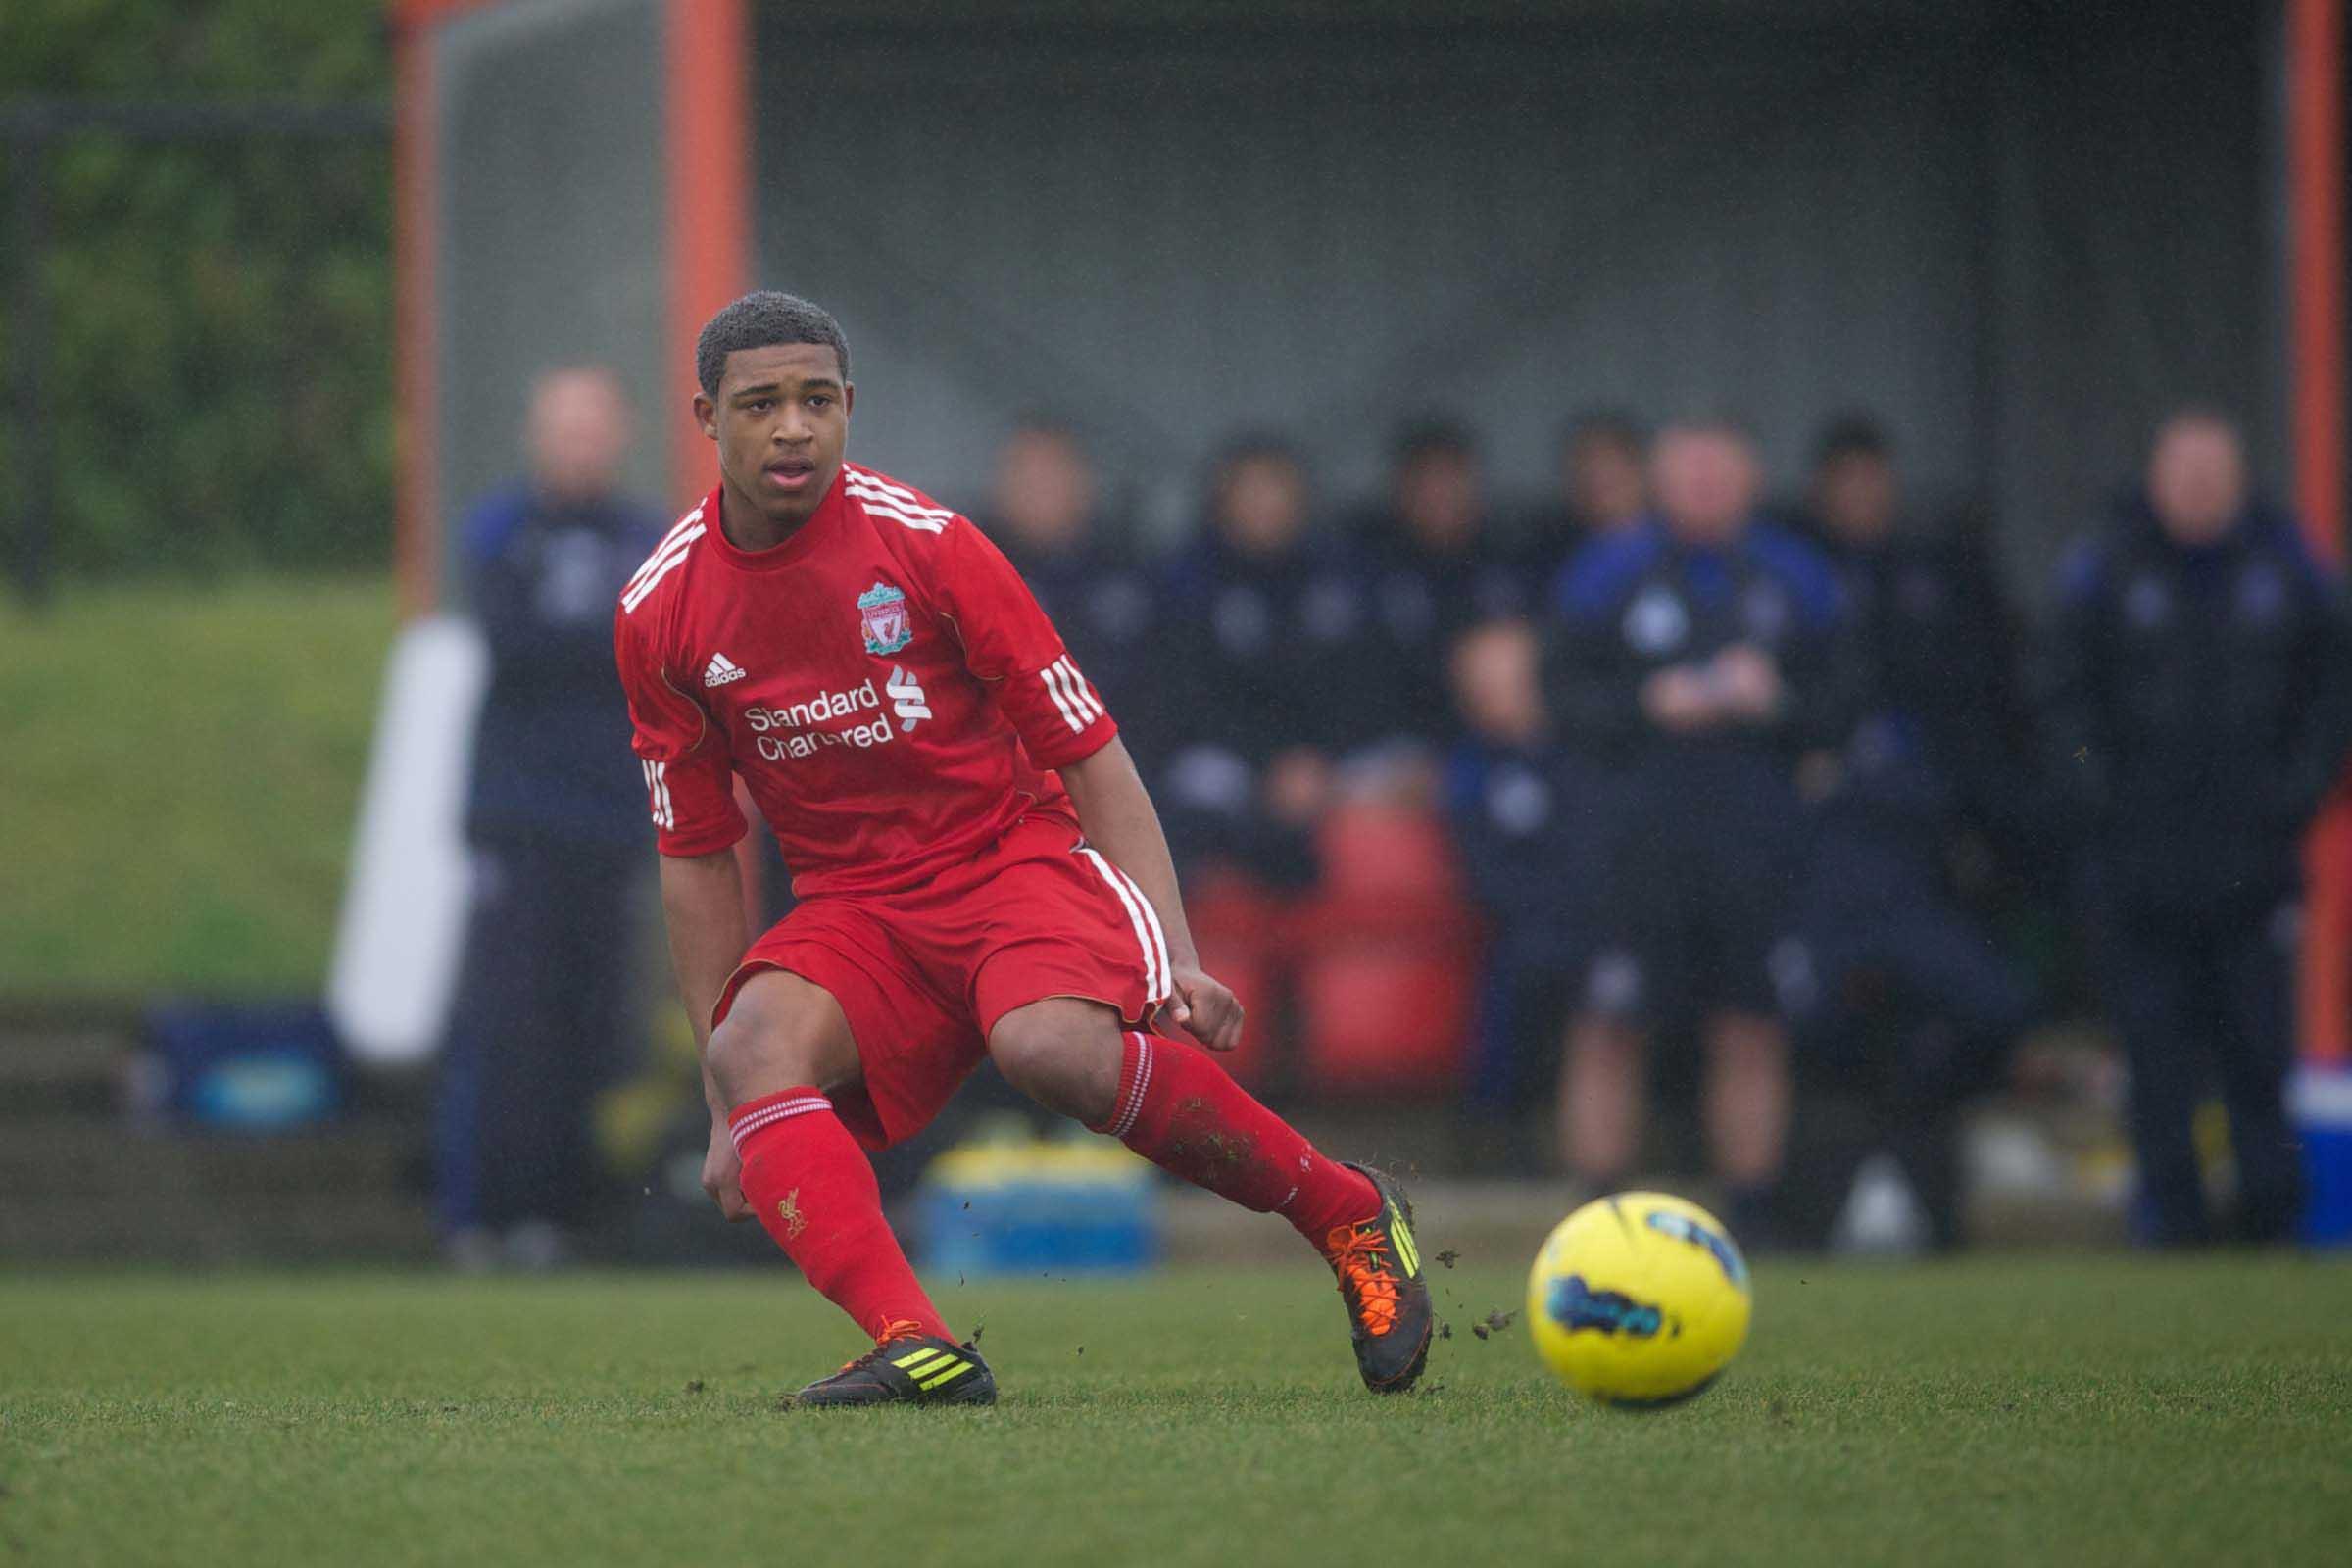 Football - FA Premier League Academy - Liverpool FC v Everton FC